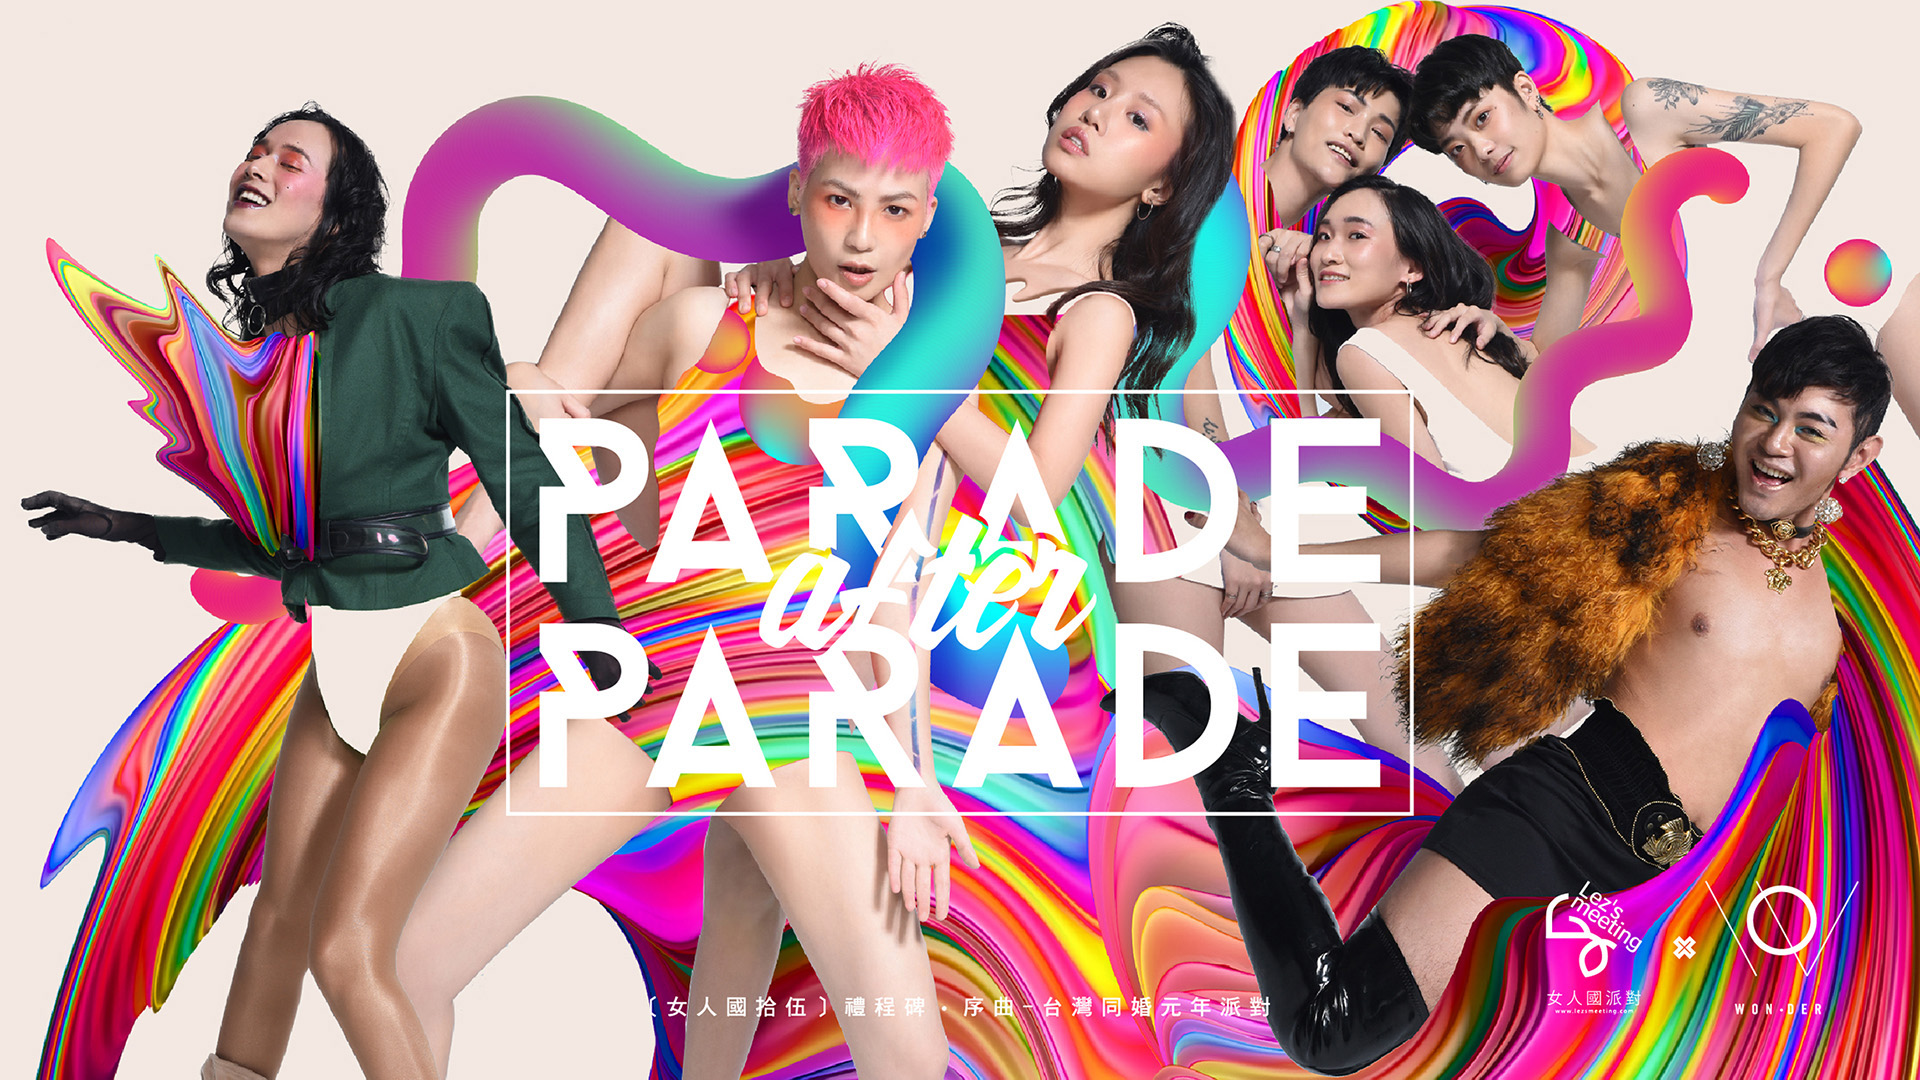 2019 Taiwan Gay Pride After Party  〔Lez's Meeting女人國 X Wonder Bar〕PARADE after PARADE